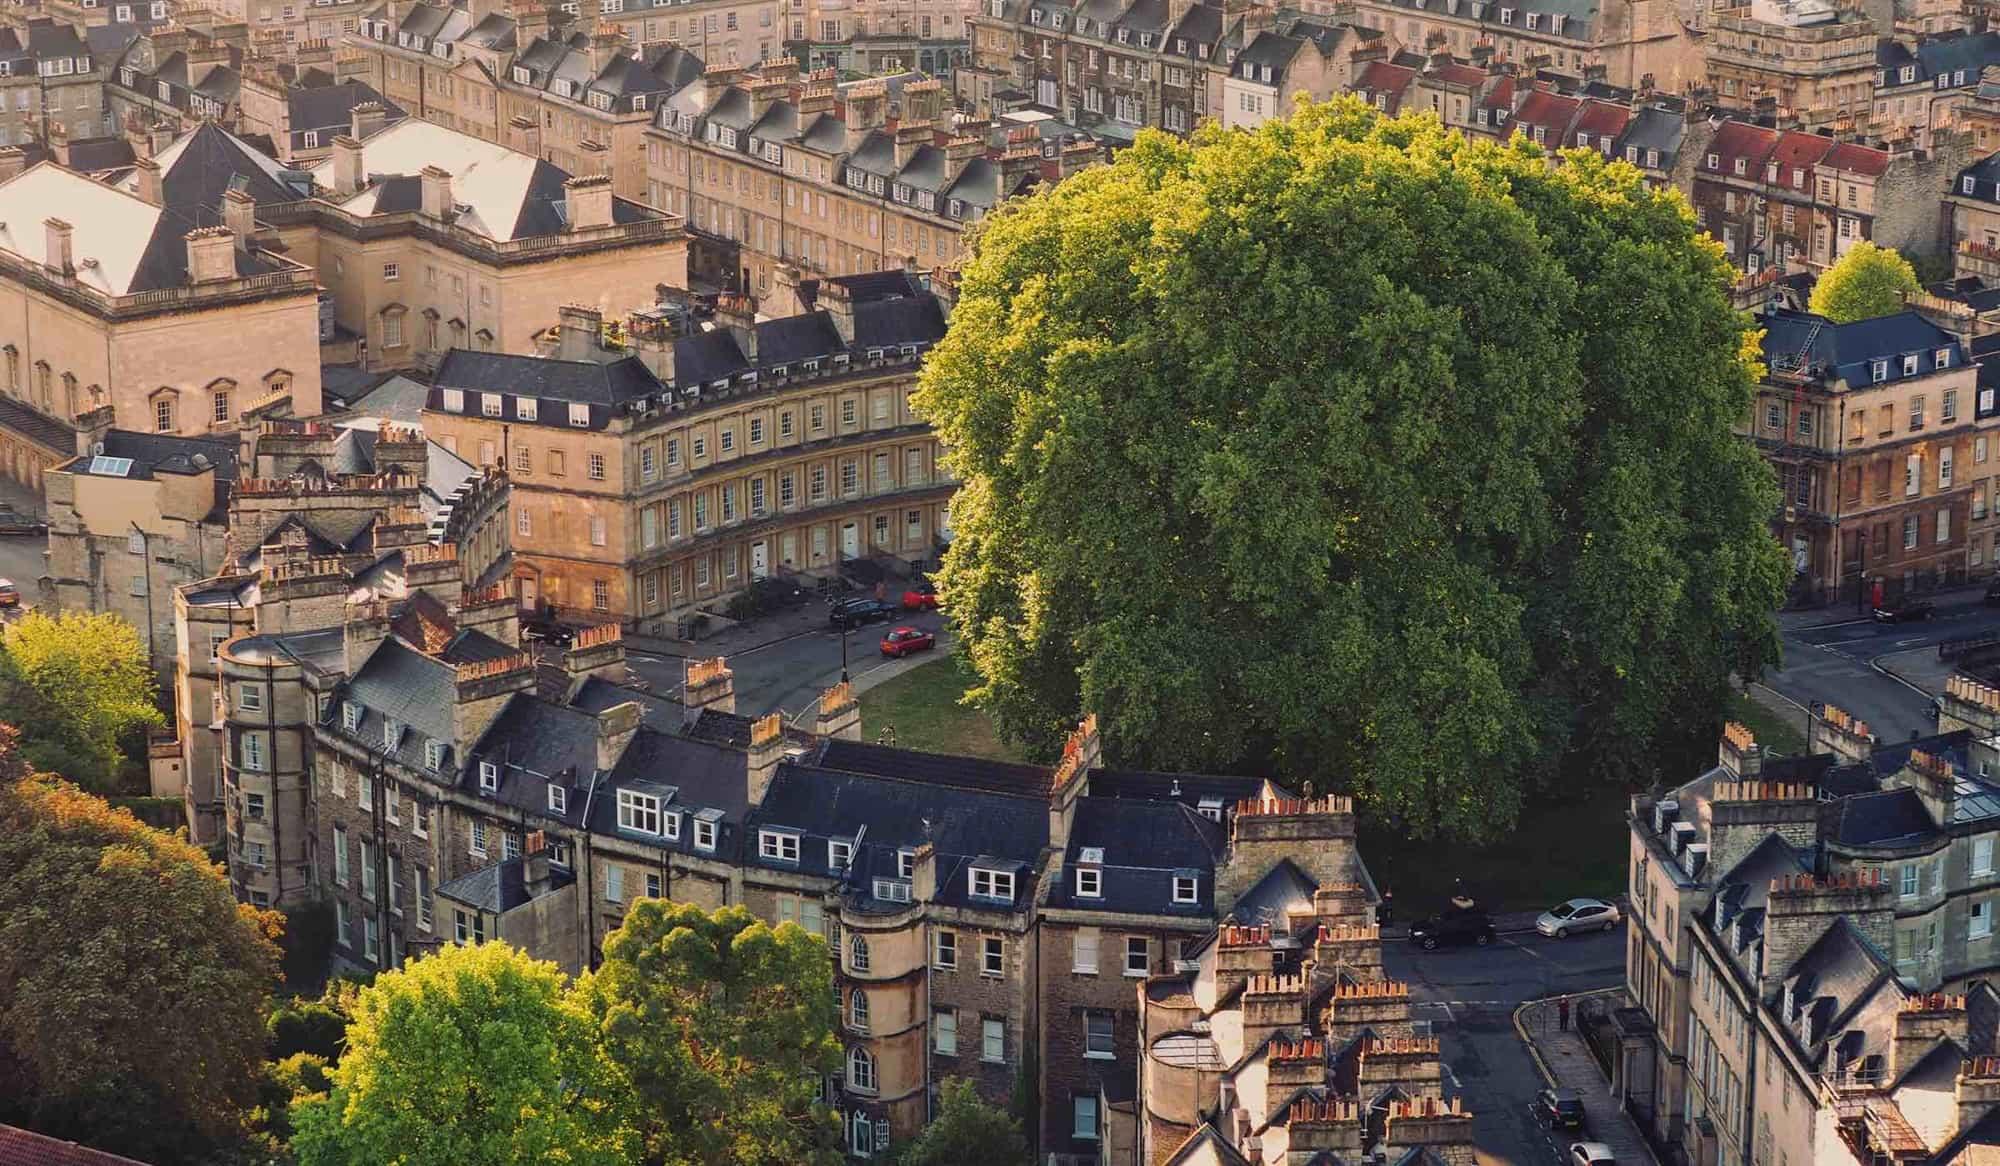 The Georgian splendour of Bath